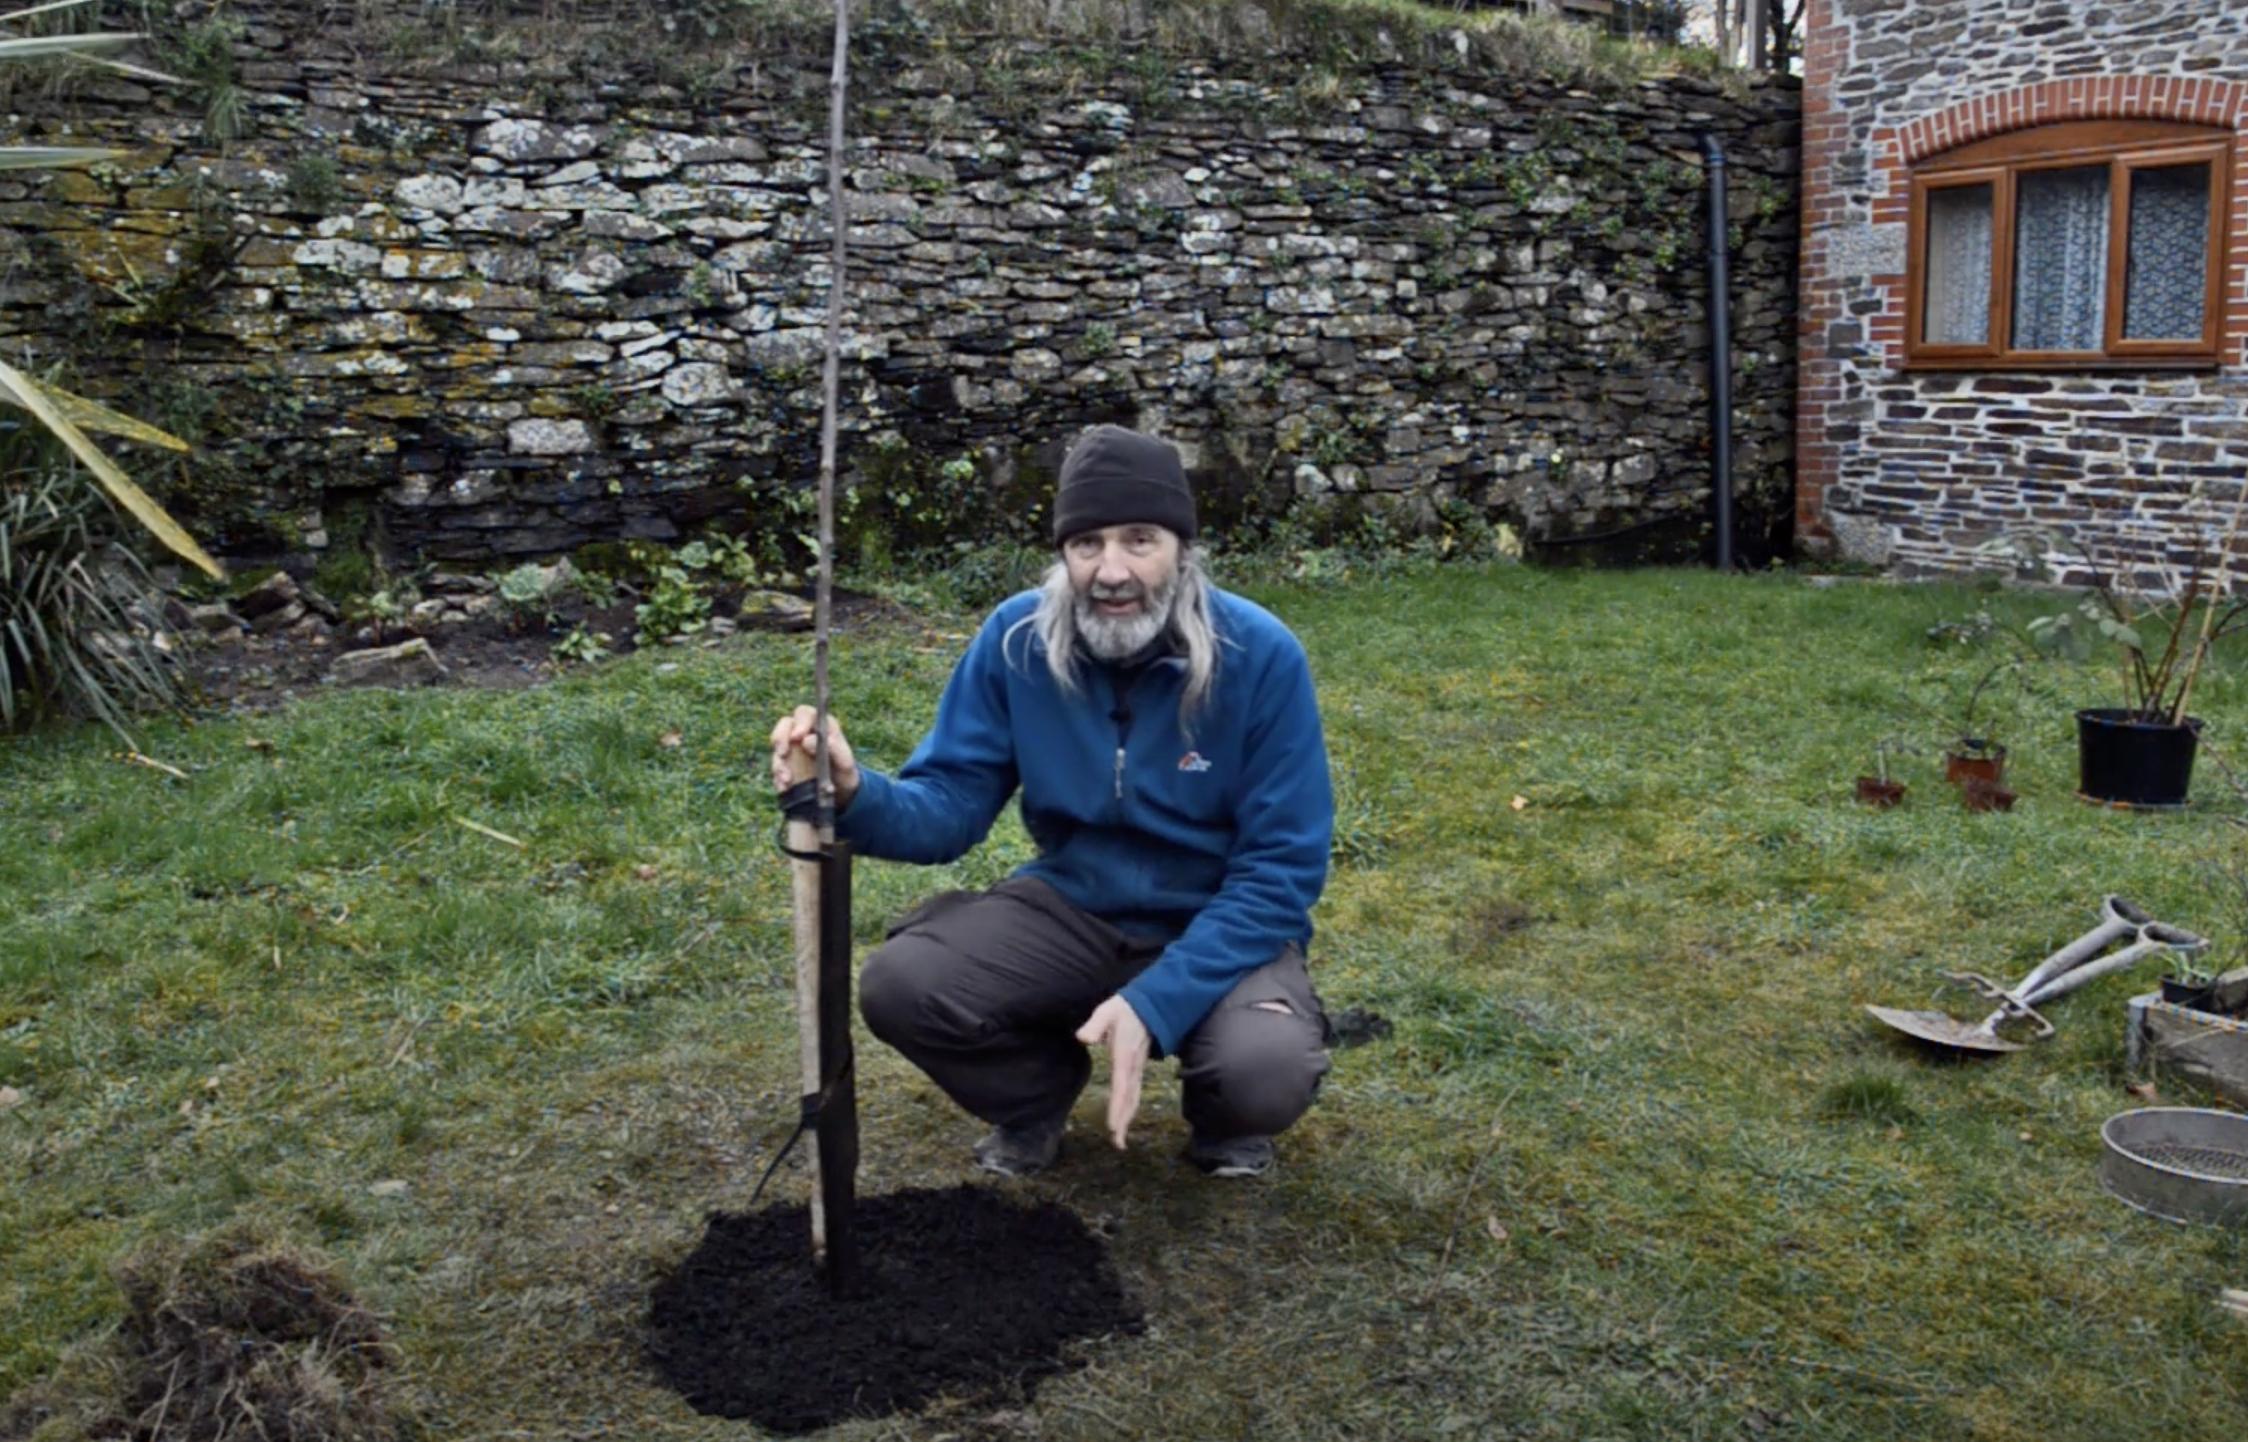 Planting a fruit tree with Aranya